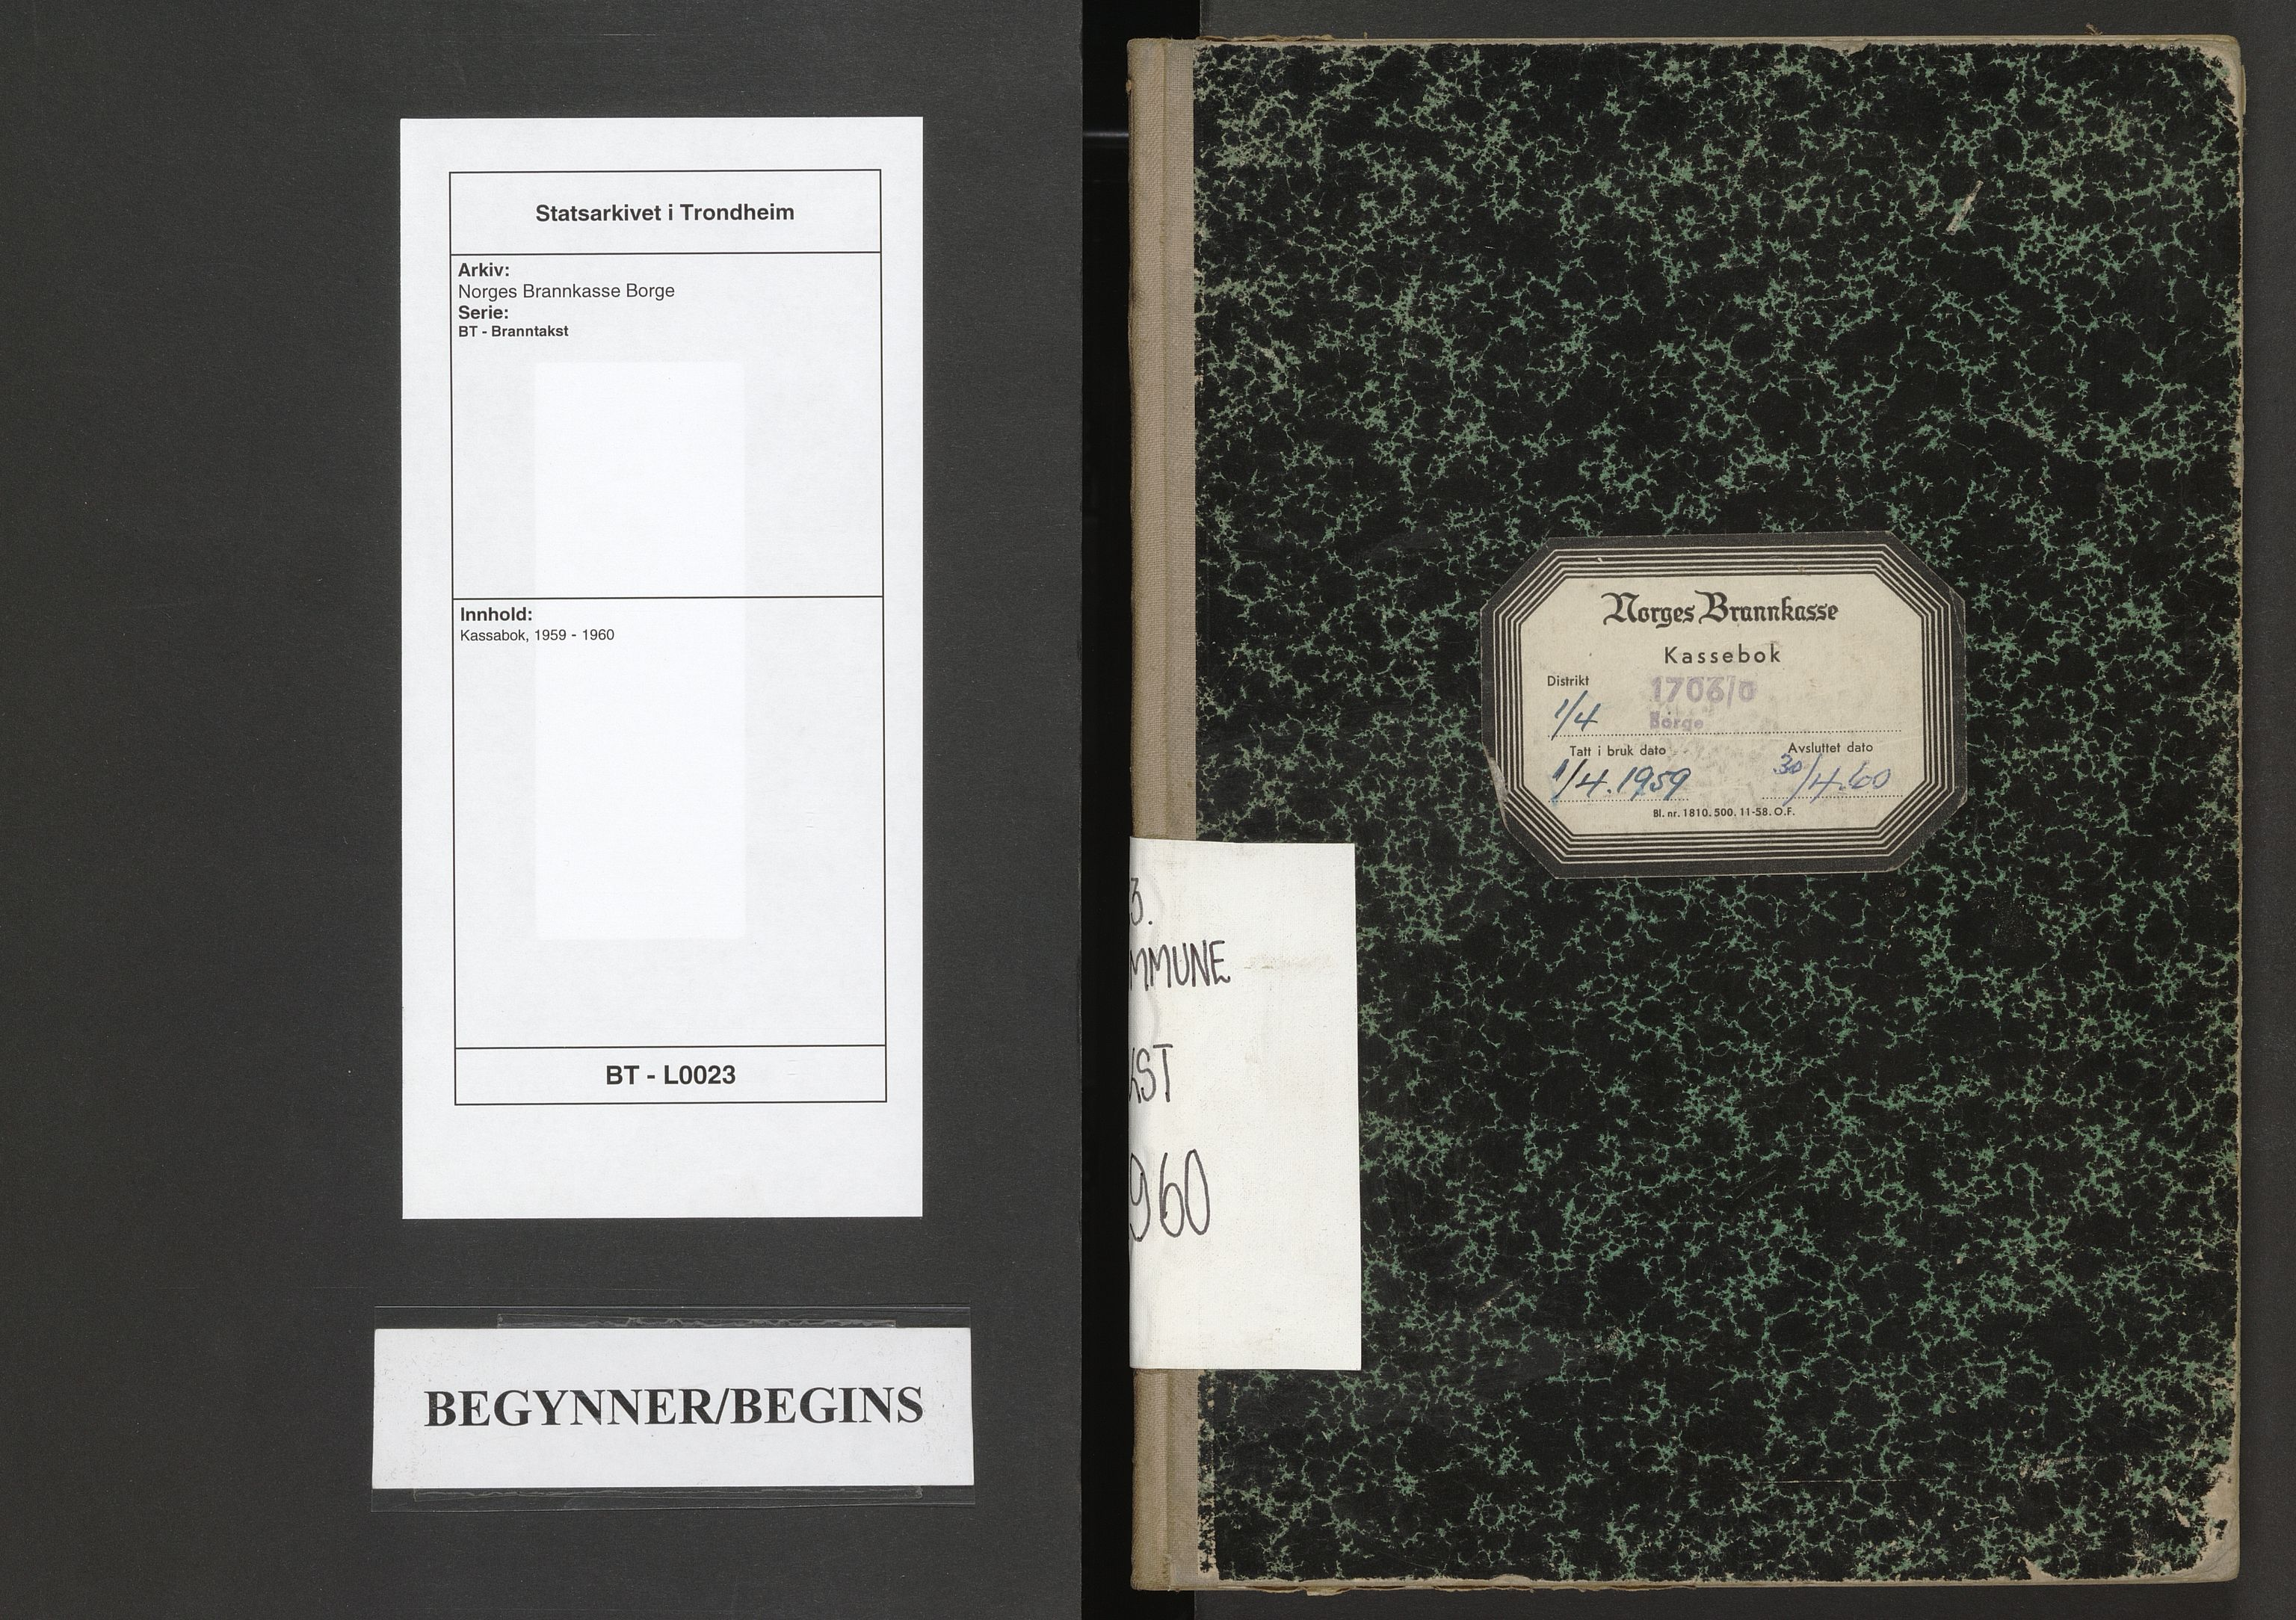 SAT, Norges Brannkasse Borge, BT/L0023: Kassabok, 1959-1960